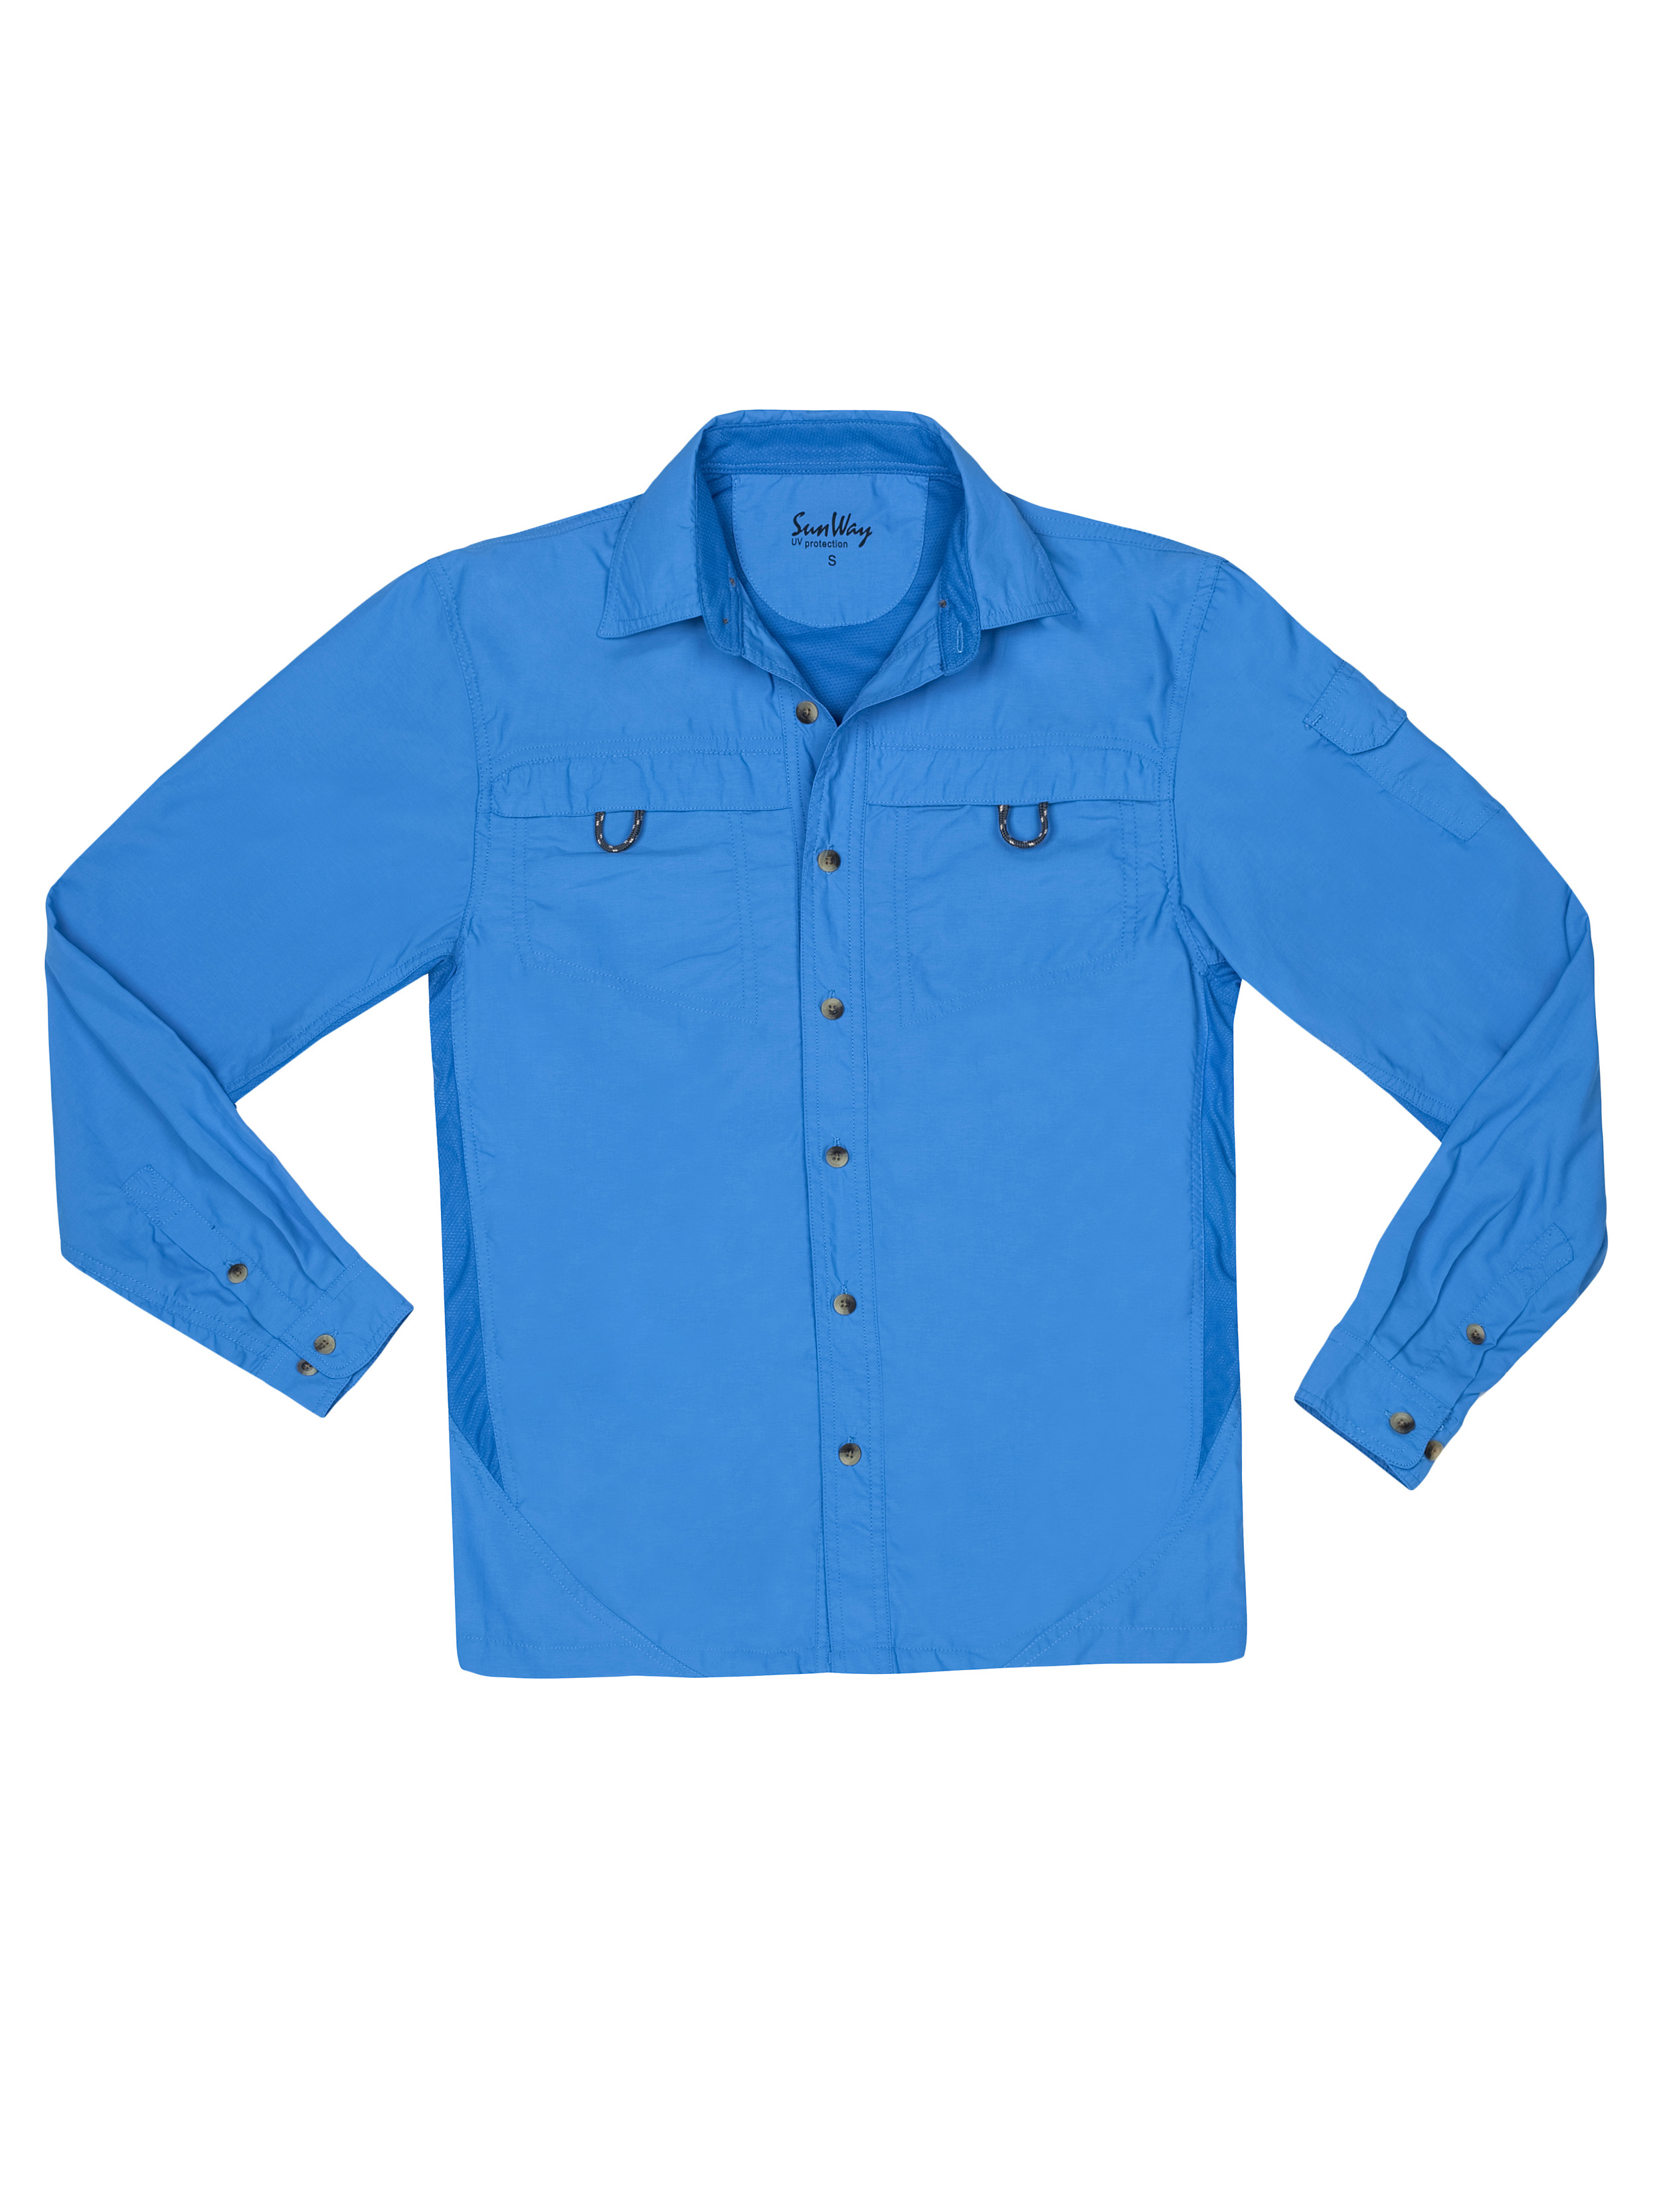 sun protective fishing shirt for men